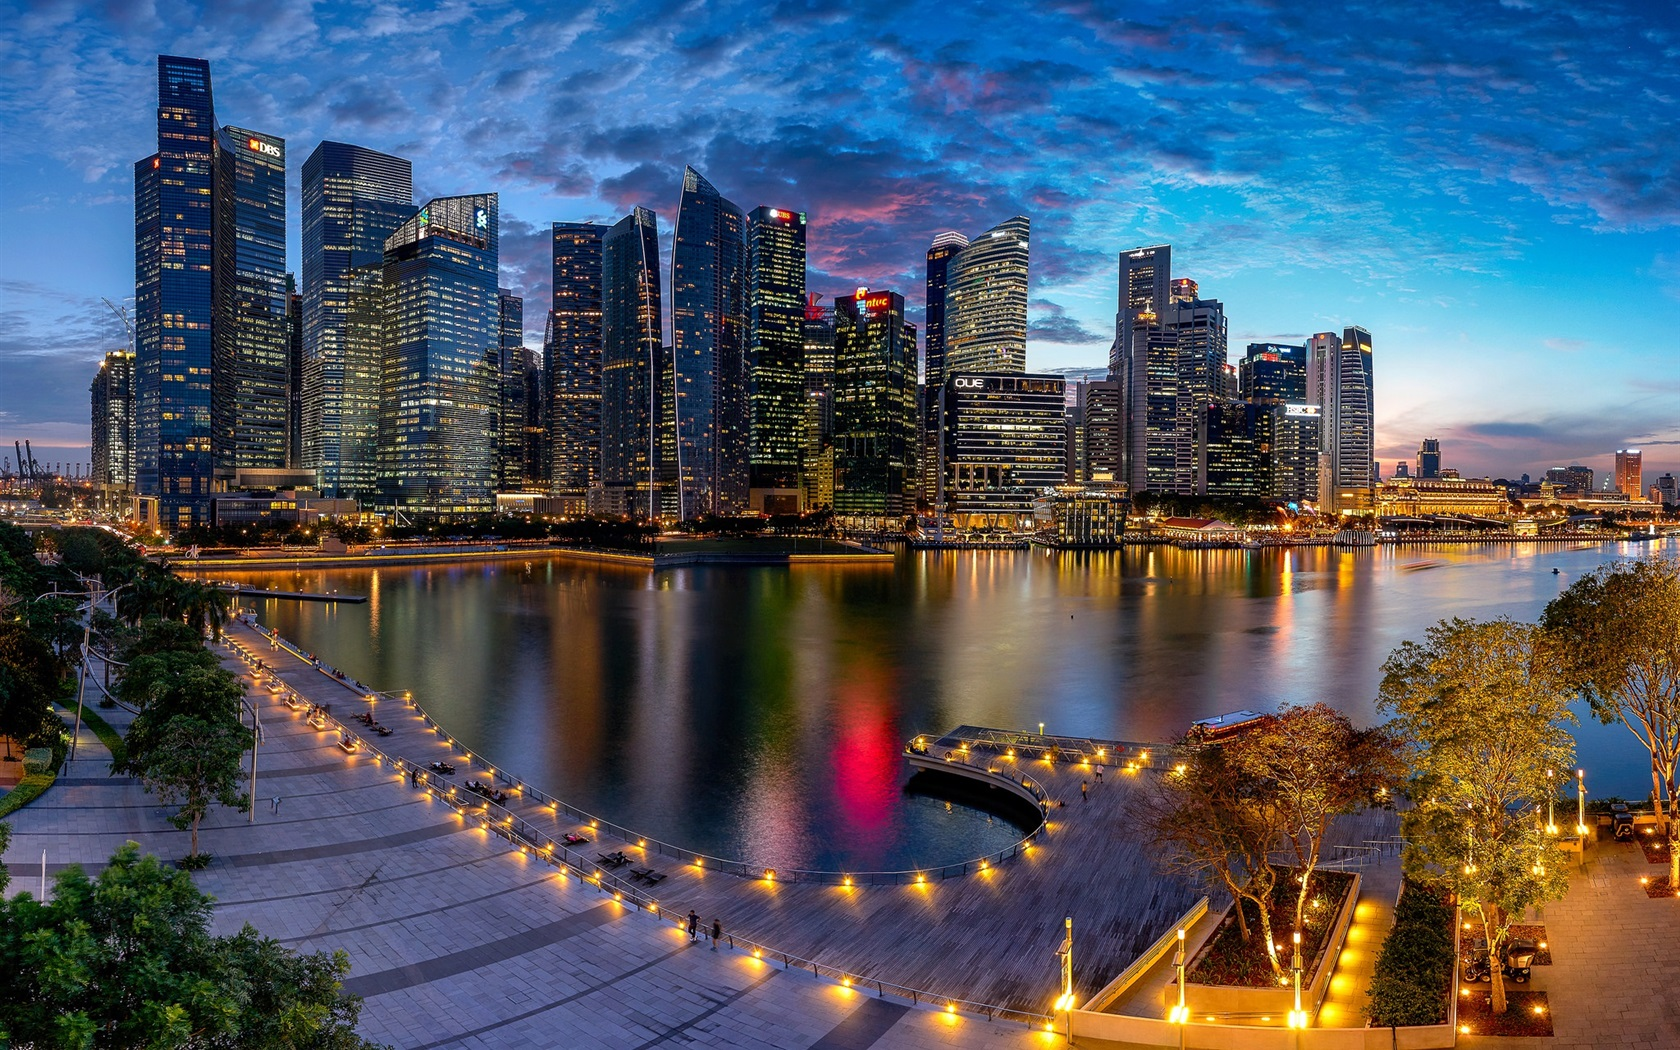 Wallpaper Marina Bay Singapore City Night Lights